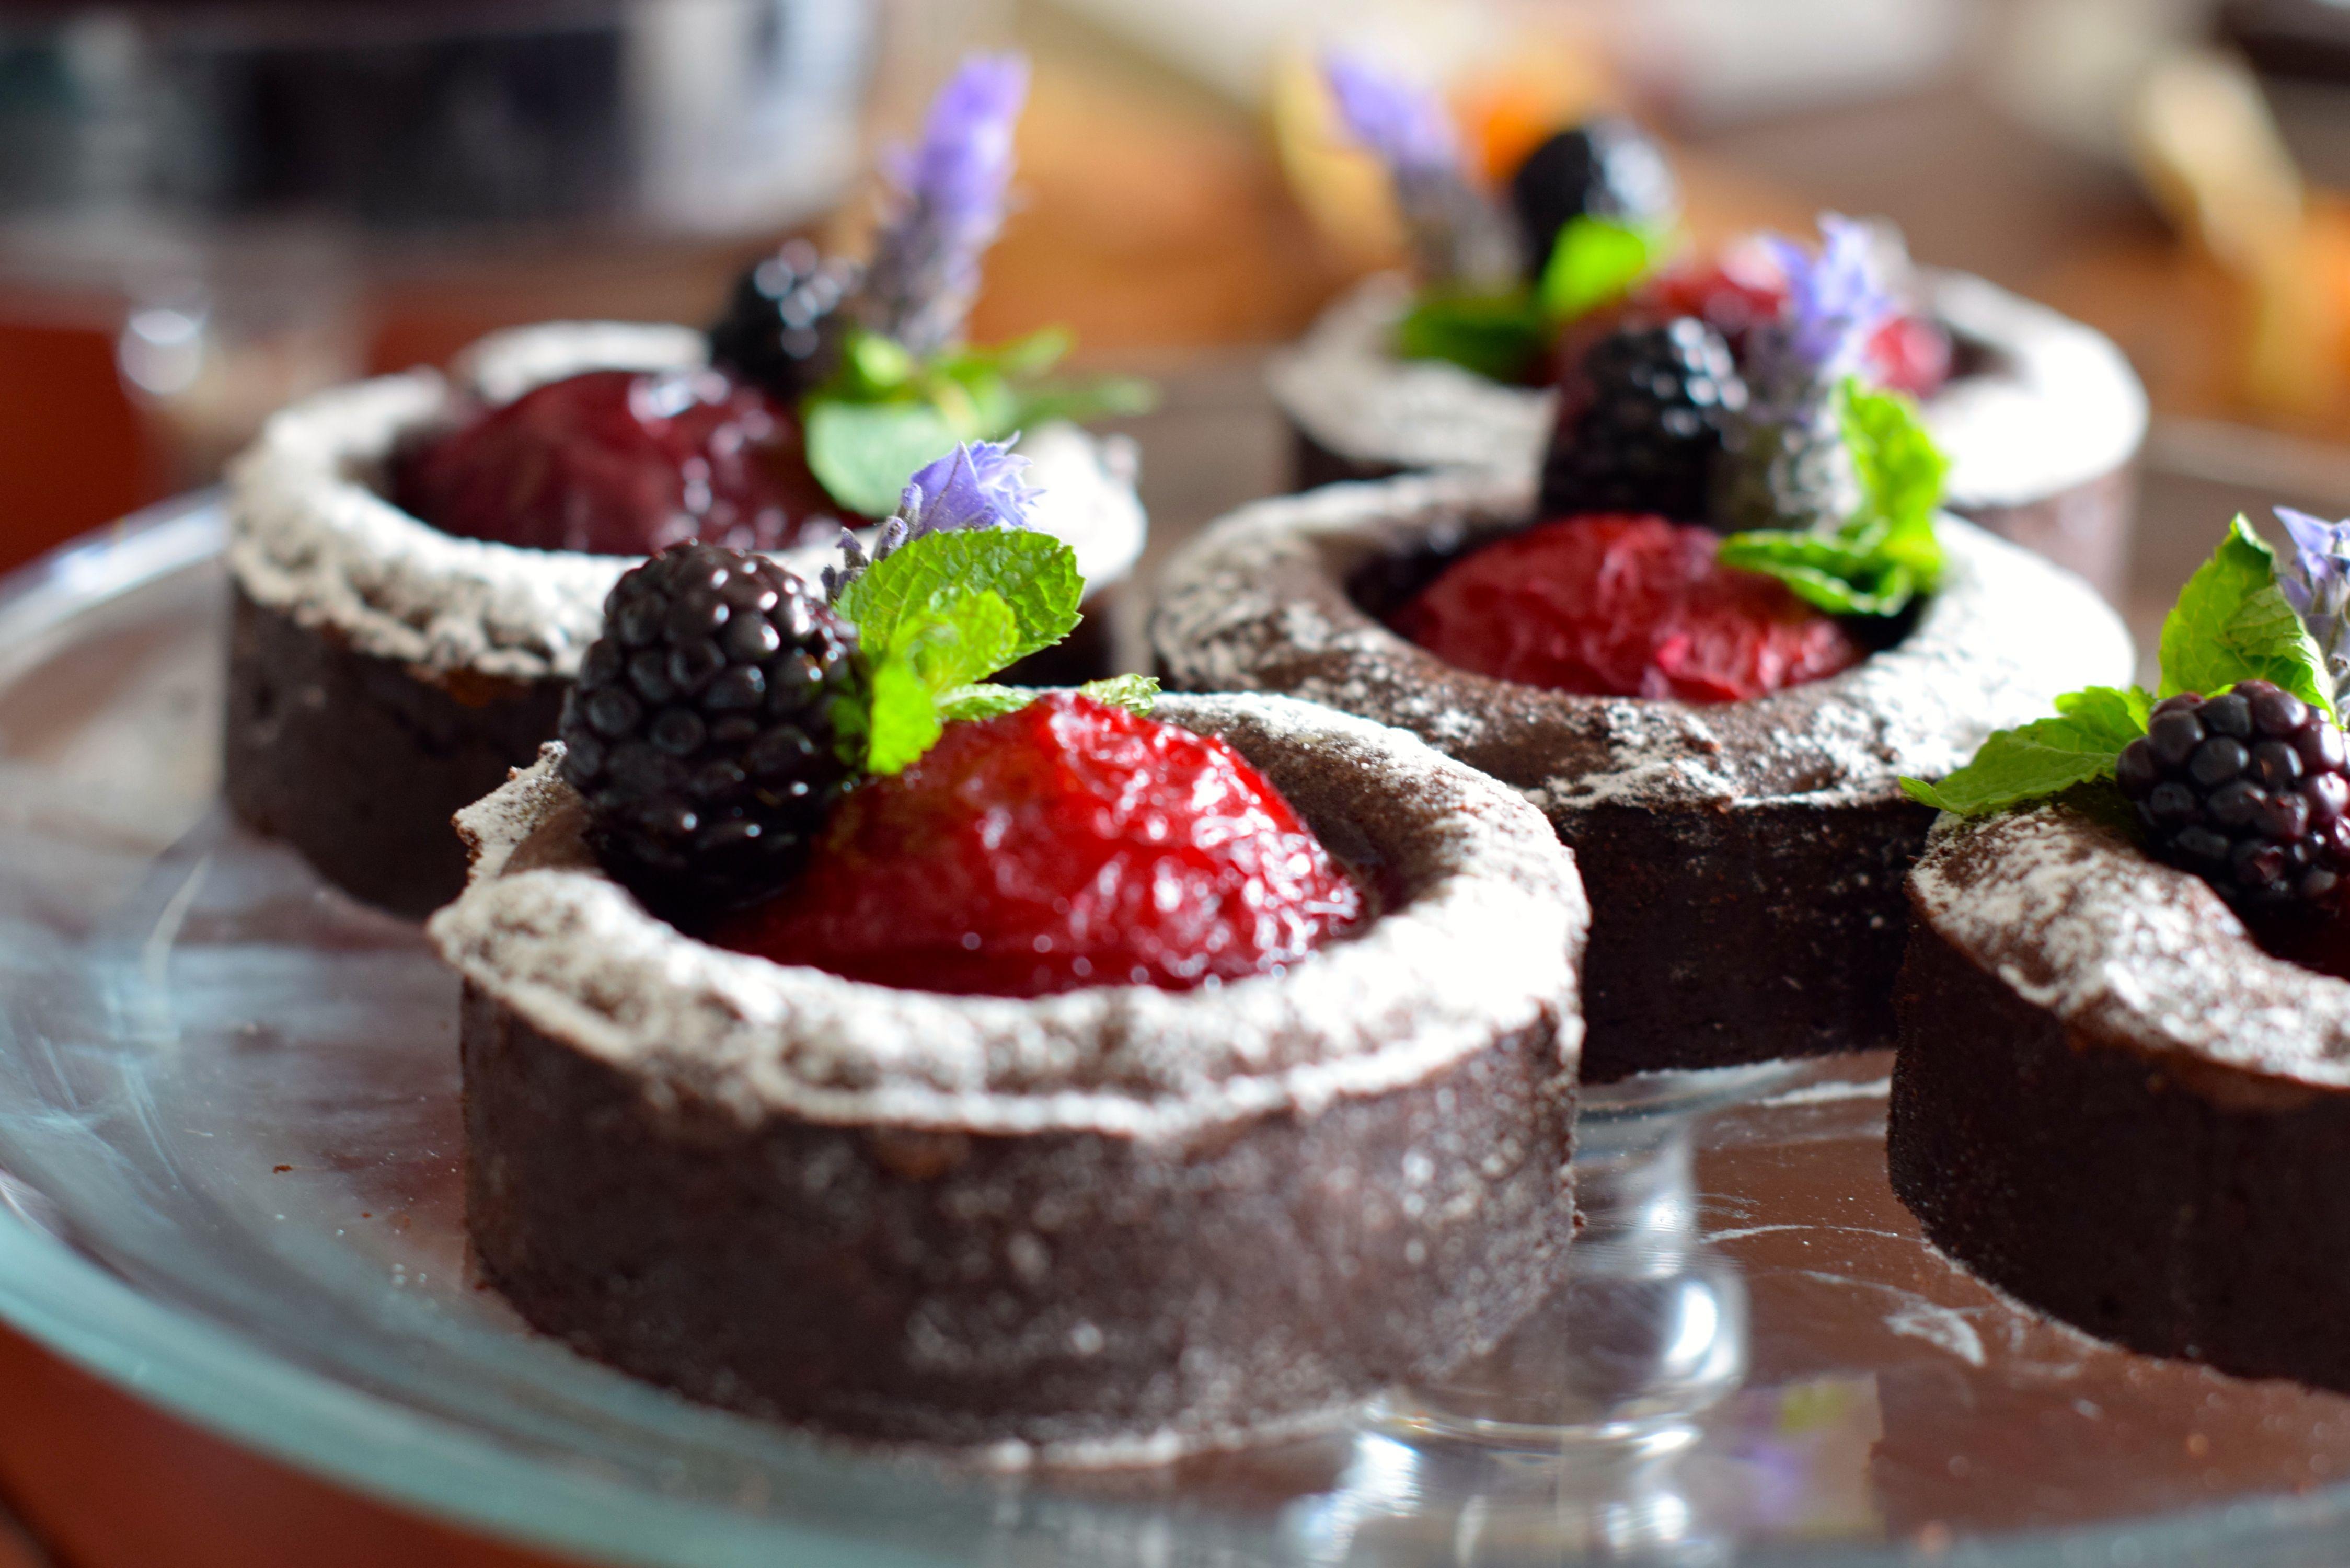 #Pie #Chocolate #Ciruelas #Plum #Postre #Dessert #DulceCoincidencia #SerendipityLS